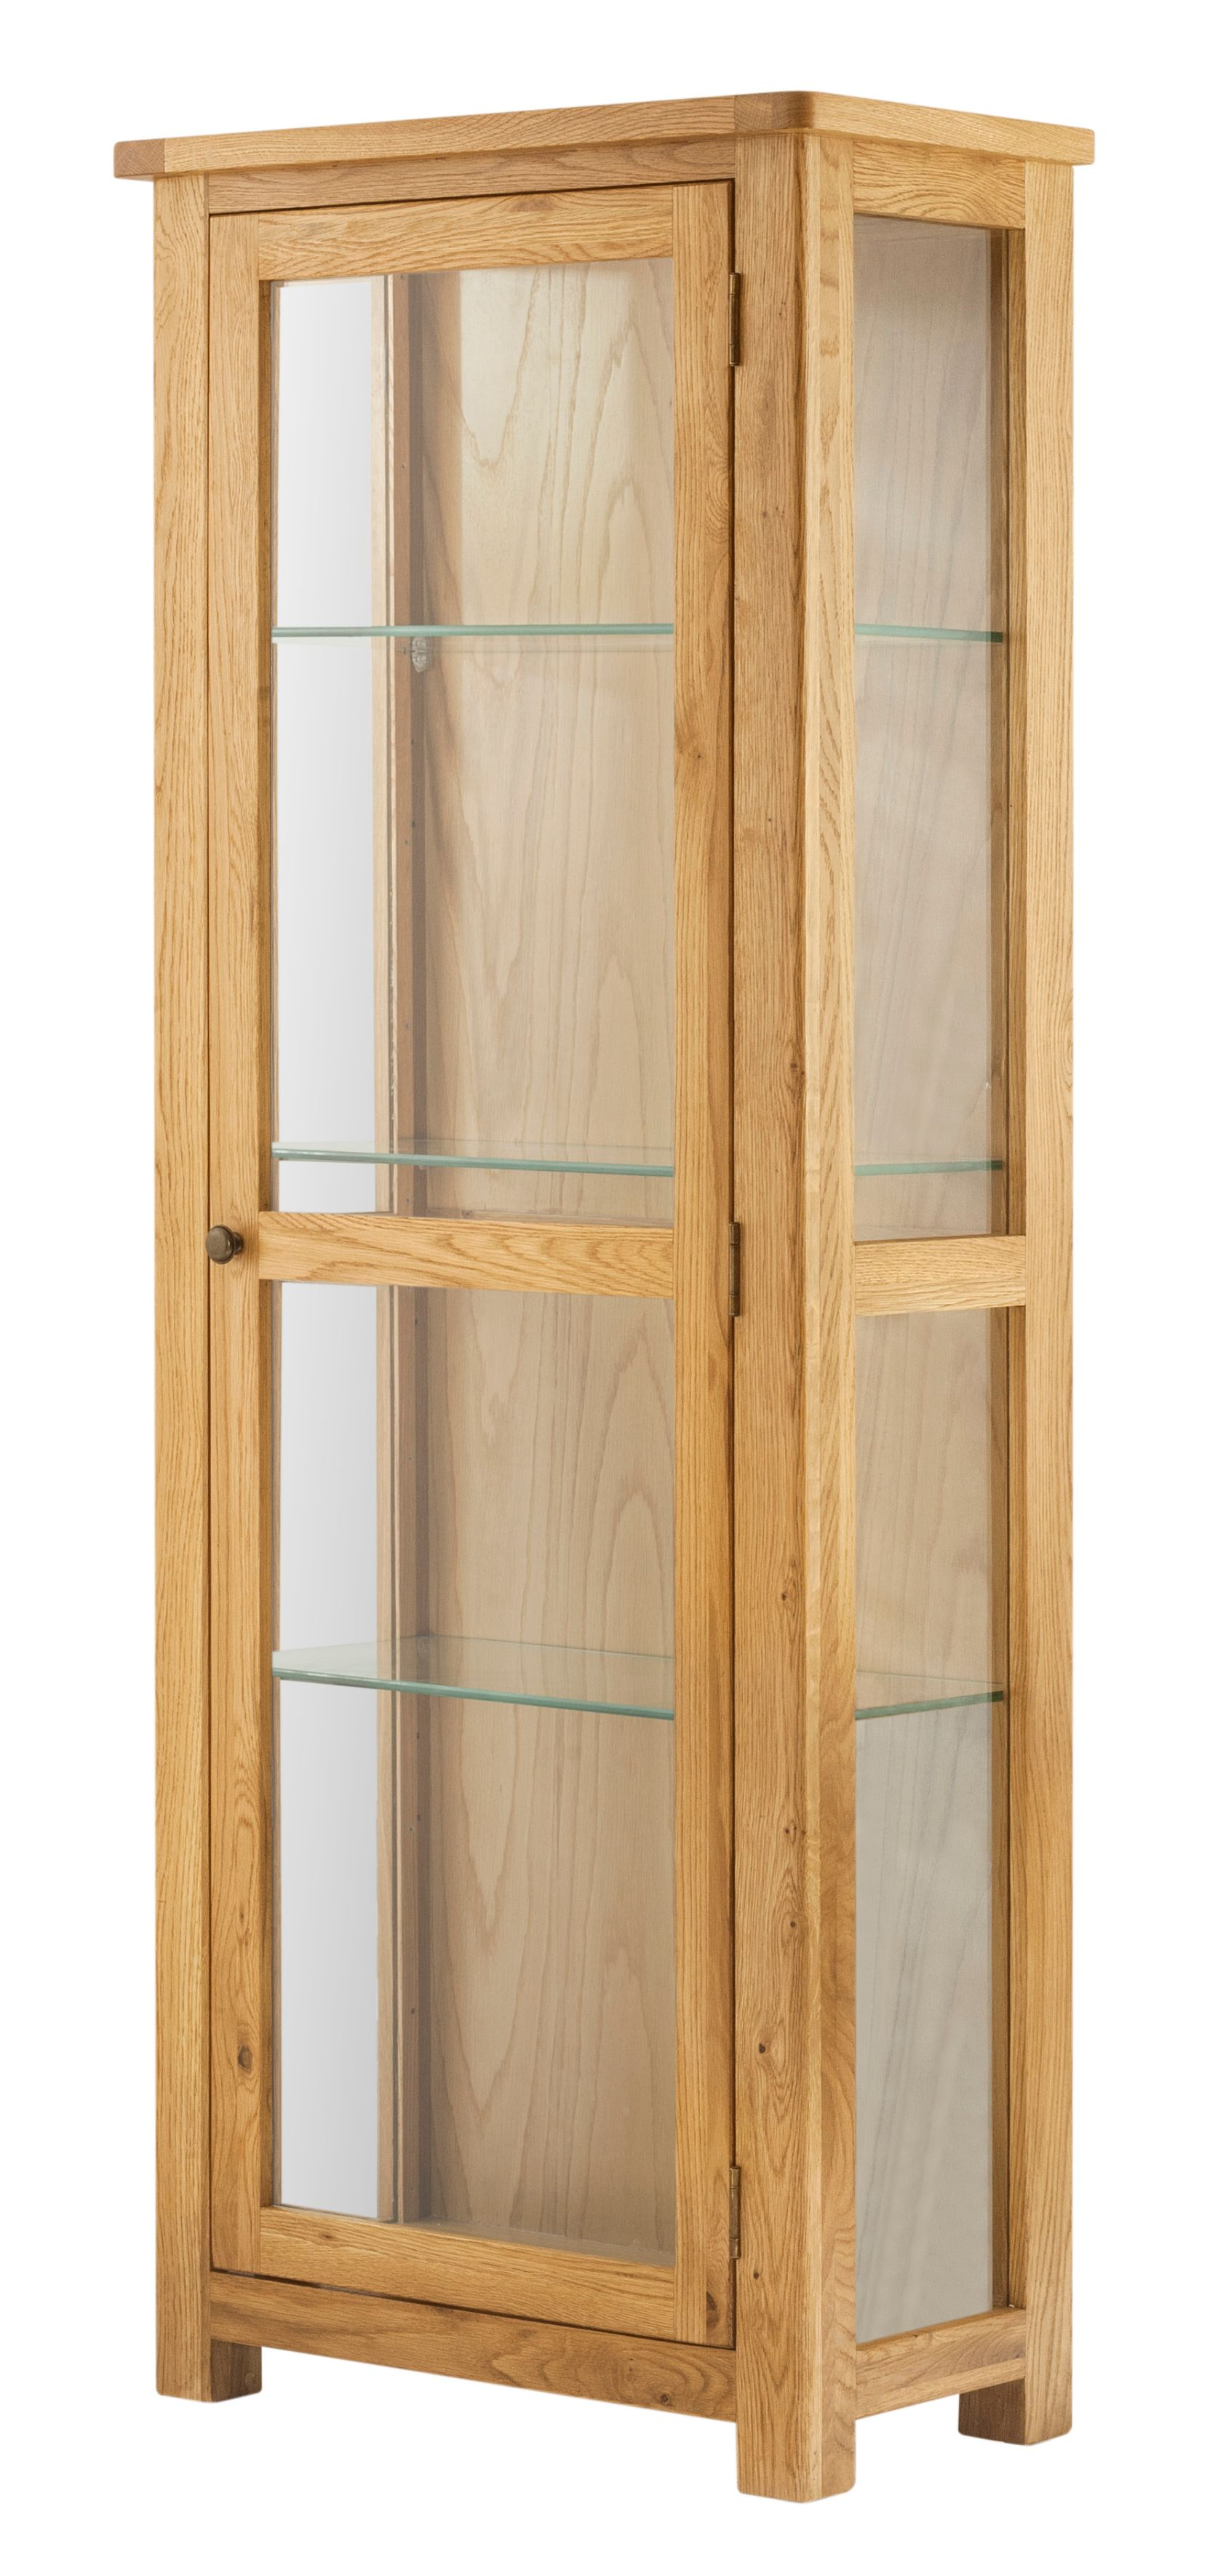 PRESTON GRAND Glazed Display Cabinet